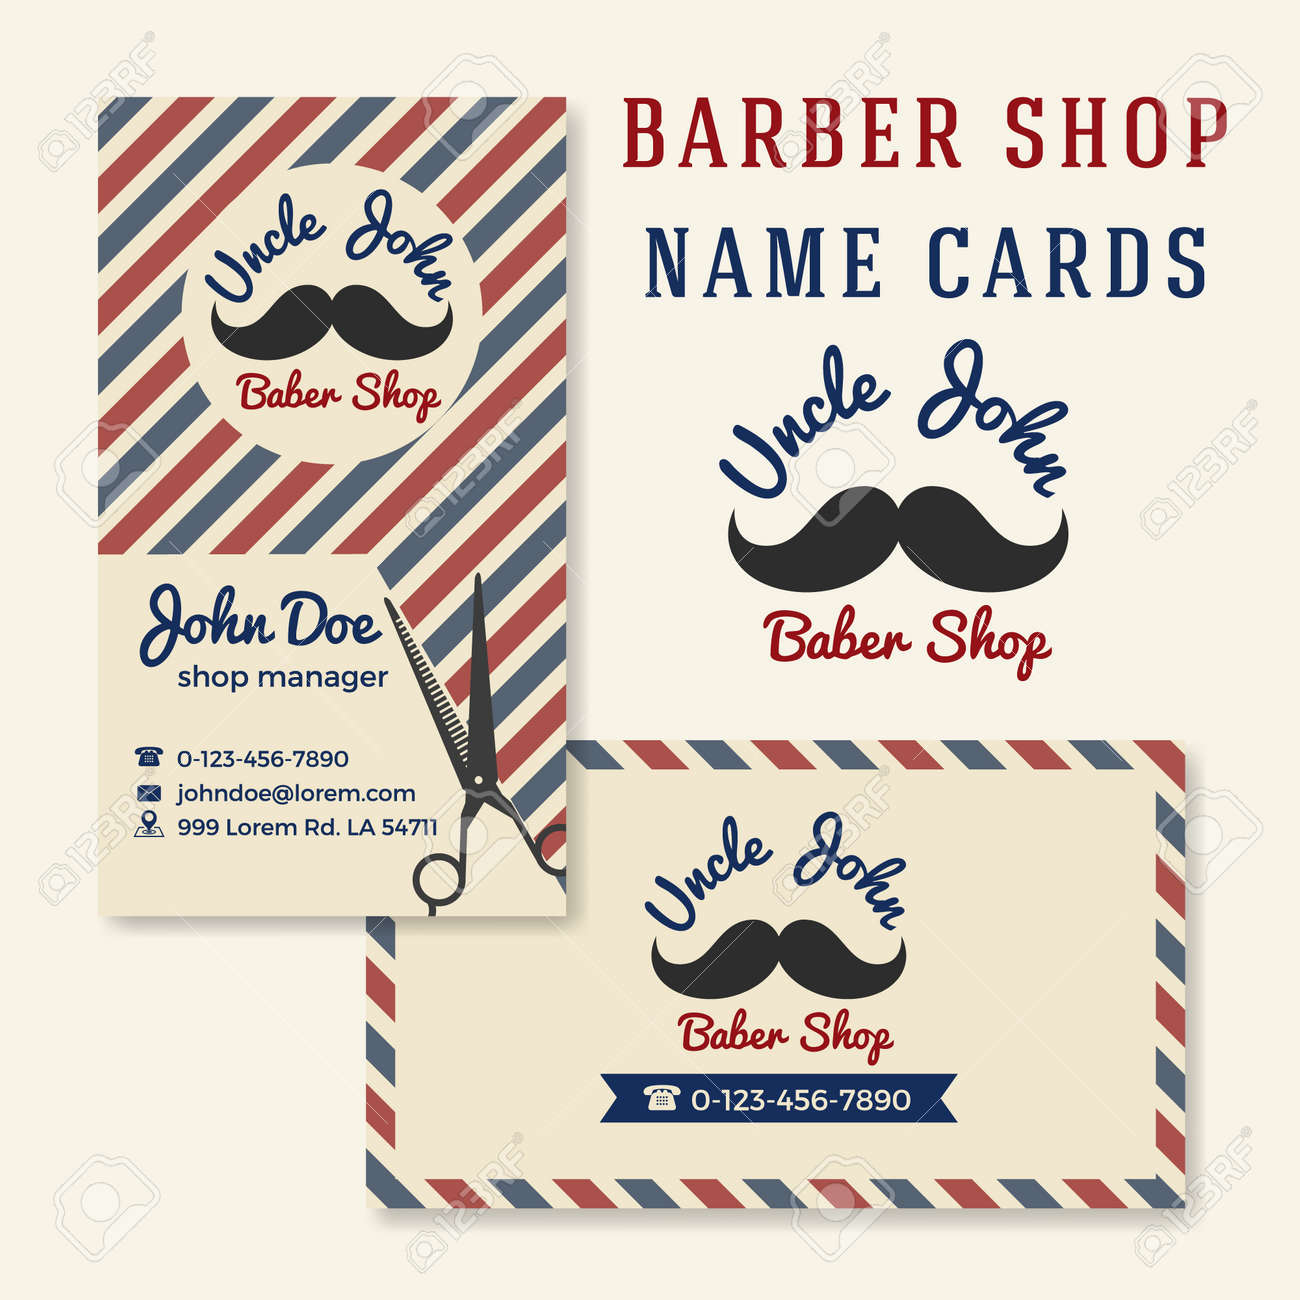 vintage barber shop business name card template royalty free